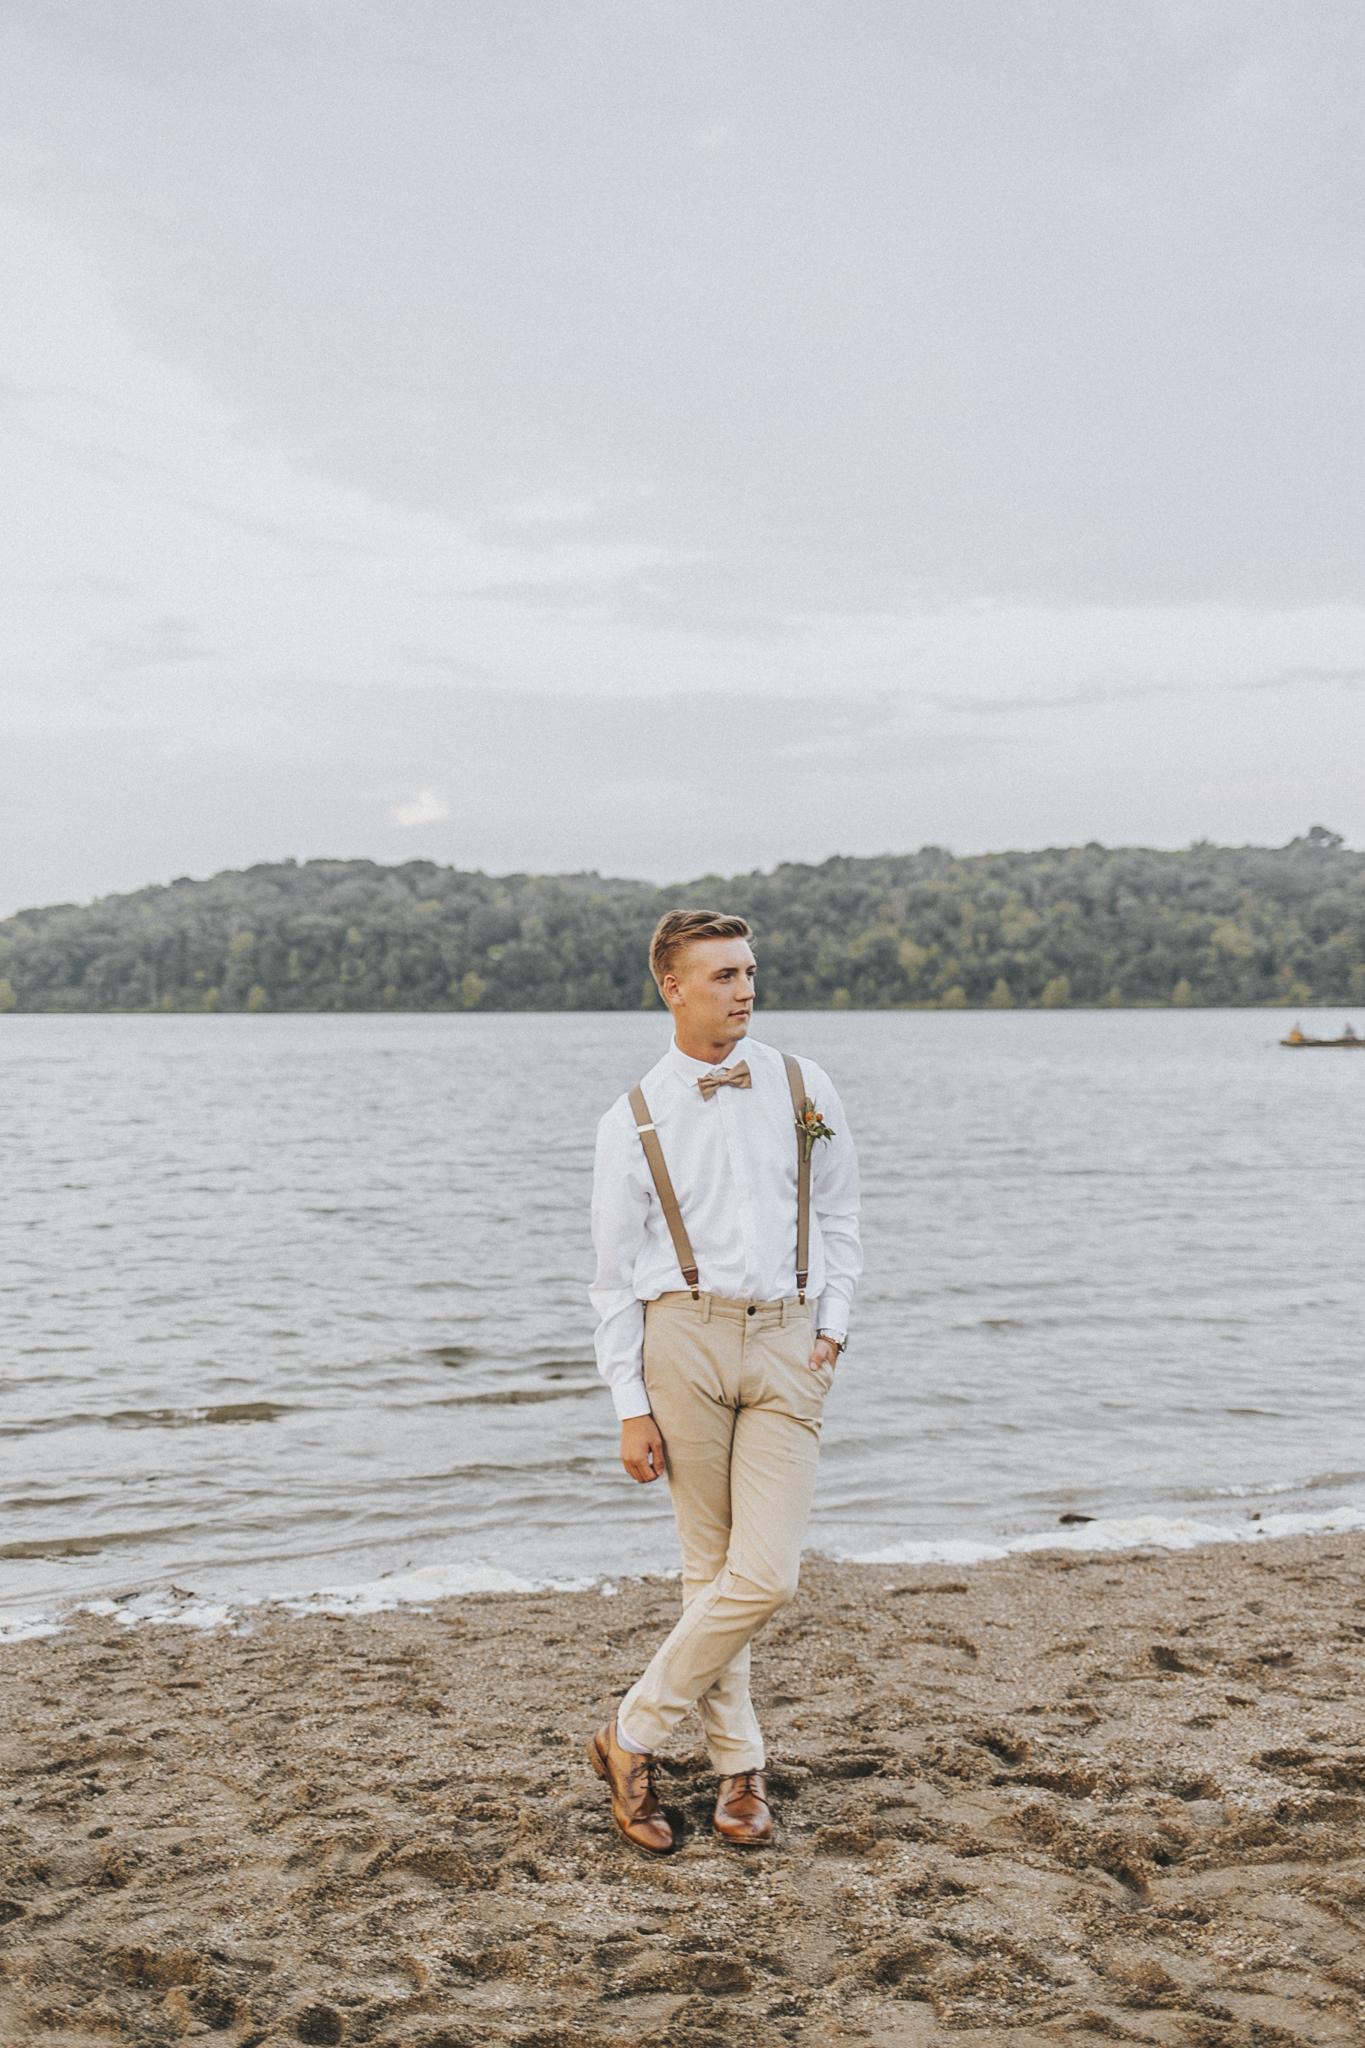 Groom portrait Shots, Cincinnati Wedding Photography at East Fork Lake, Beach Wedding Photography